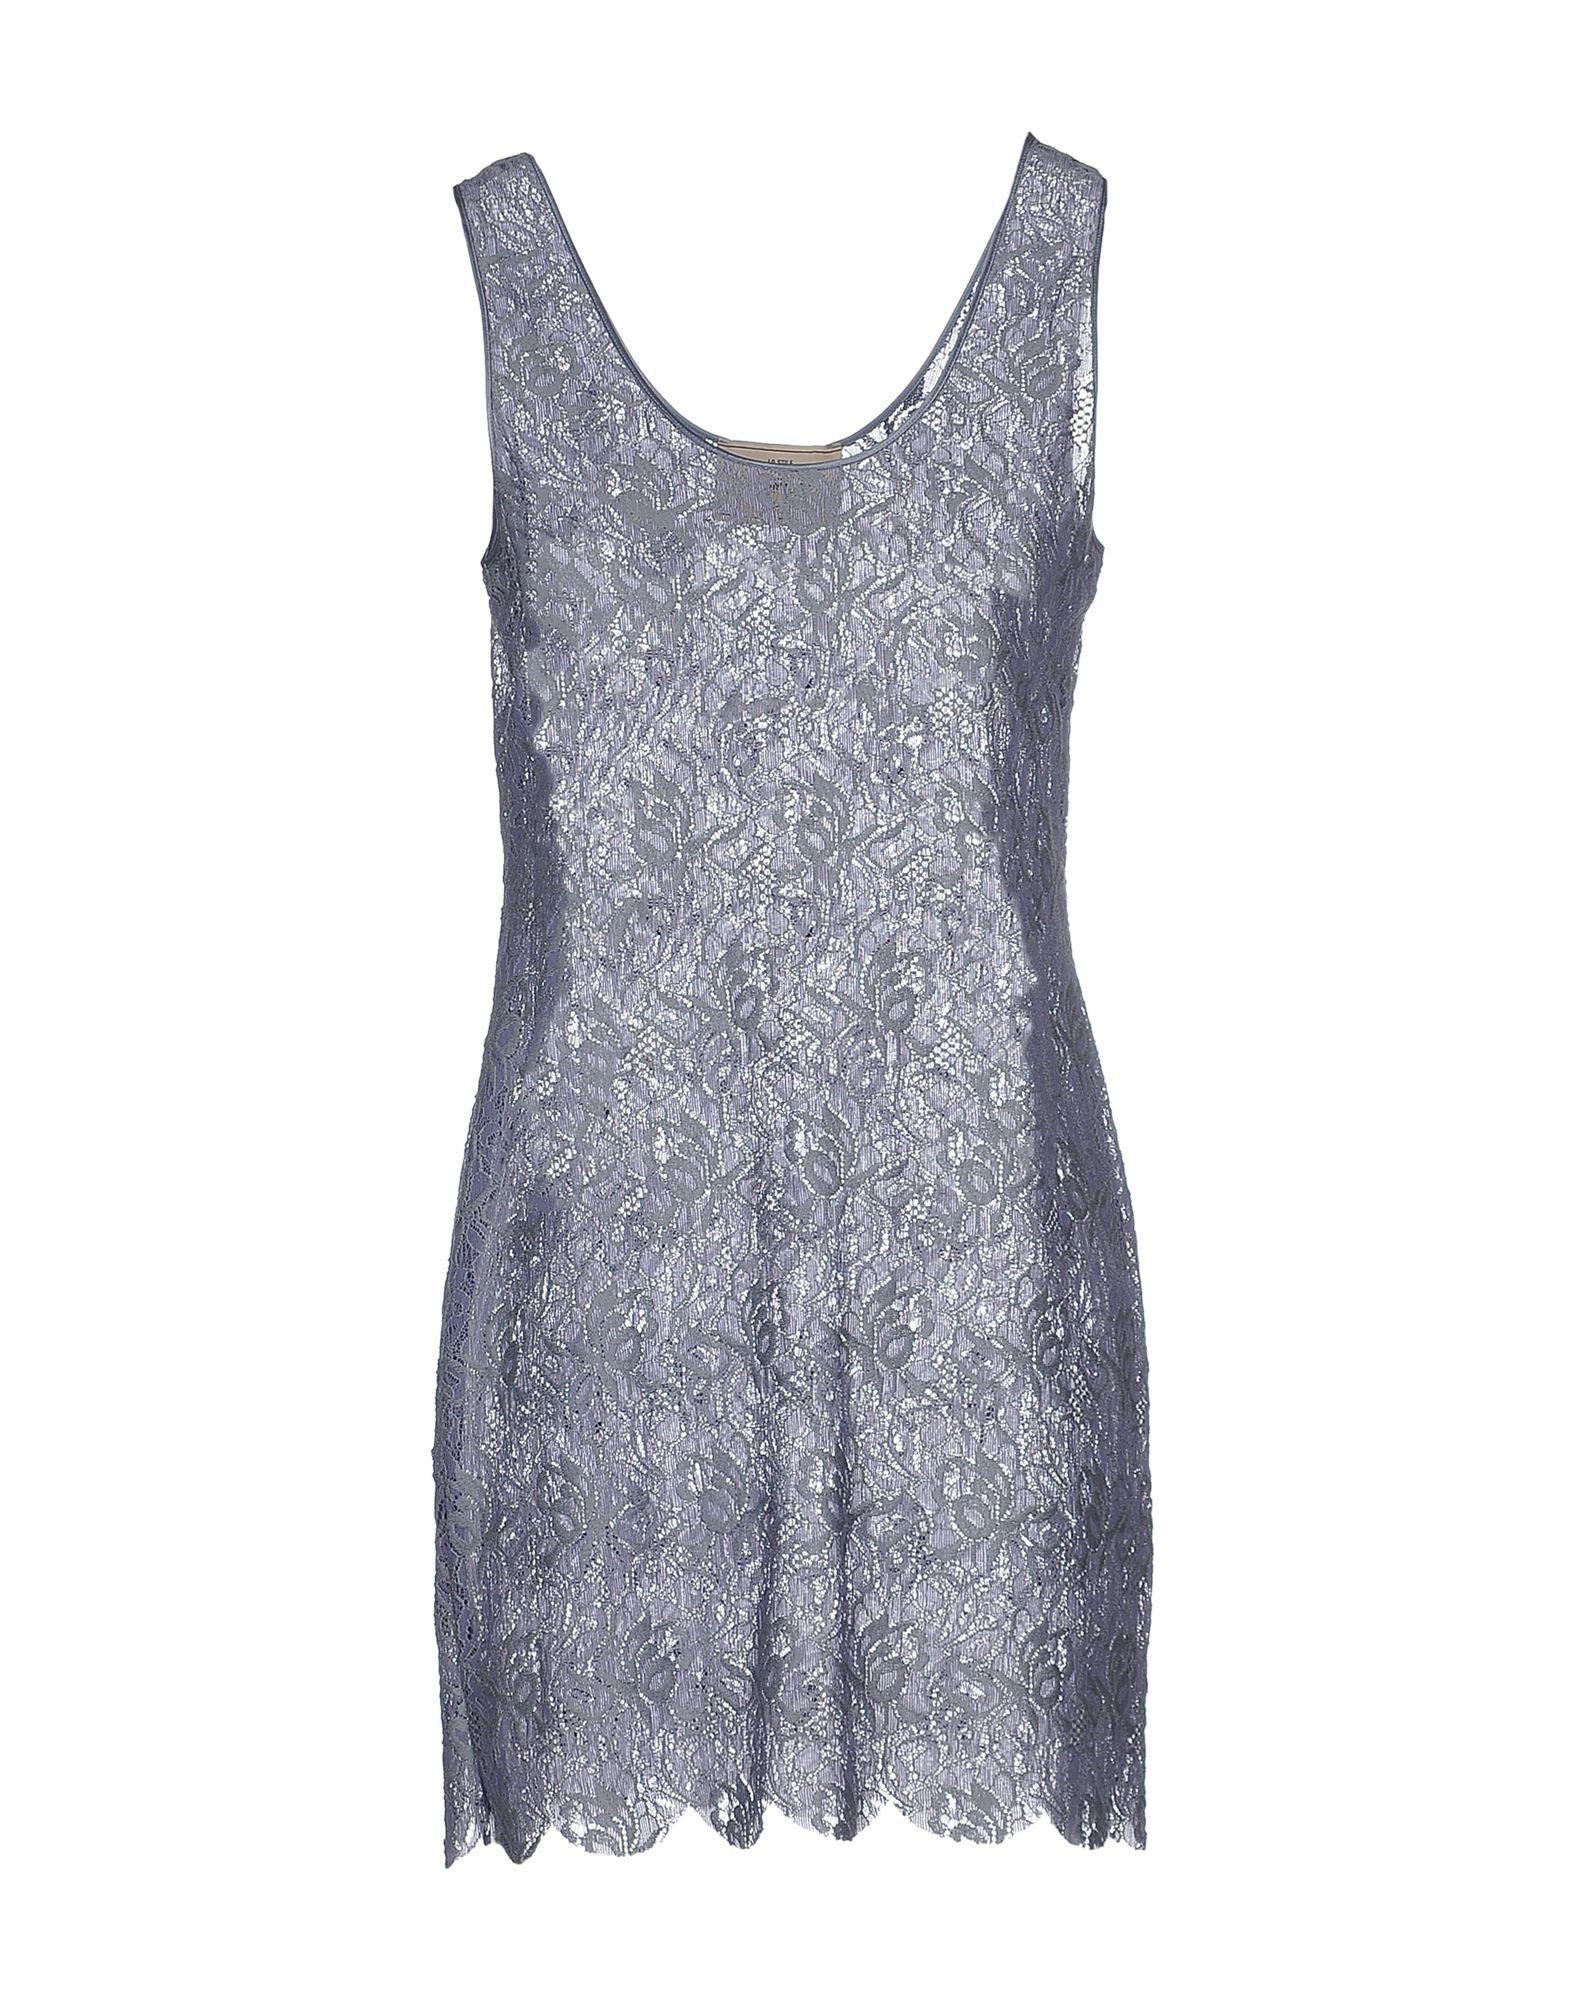 ANIYE BY Damen Kurzes Kleid Farbe Taubenblau Größe 6